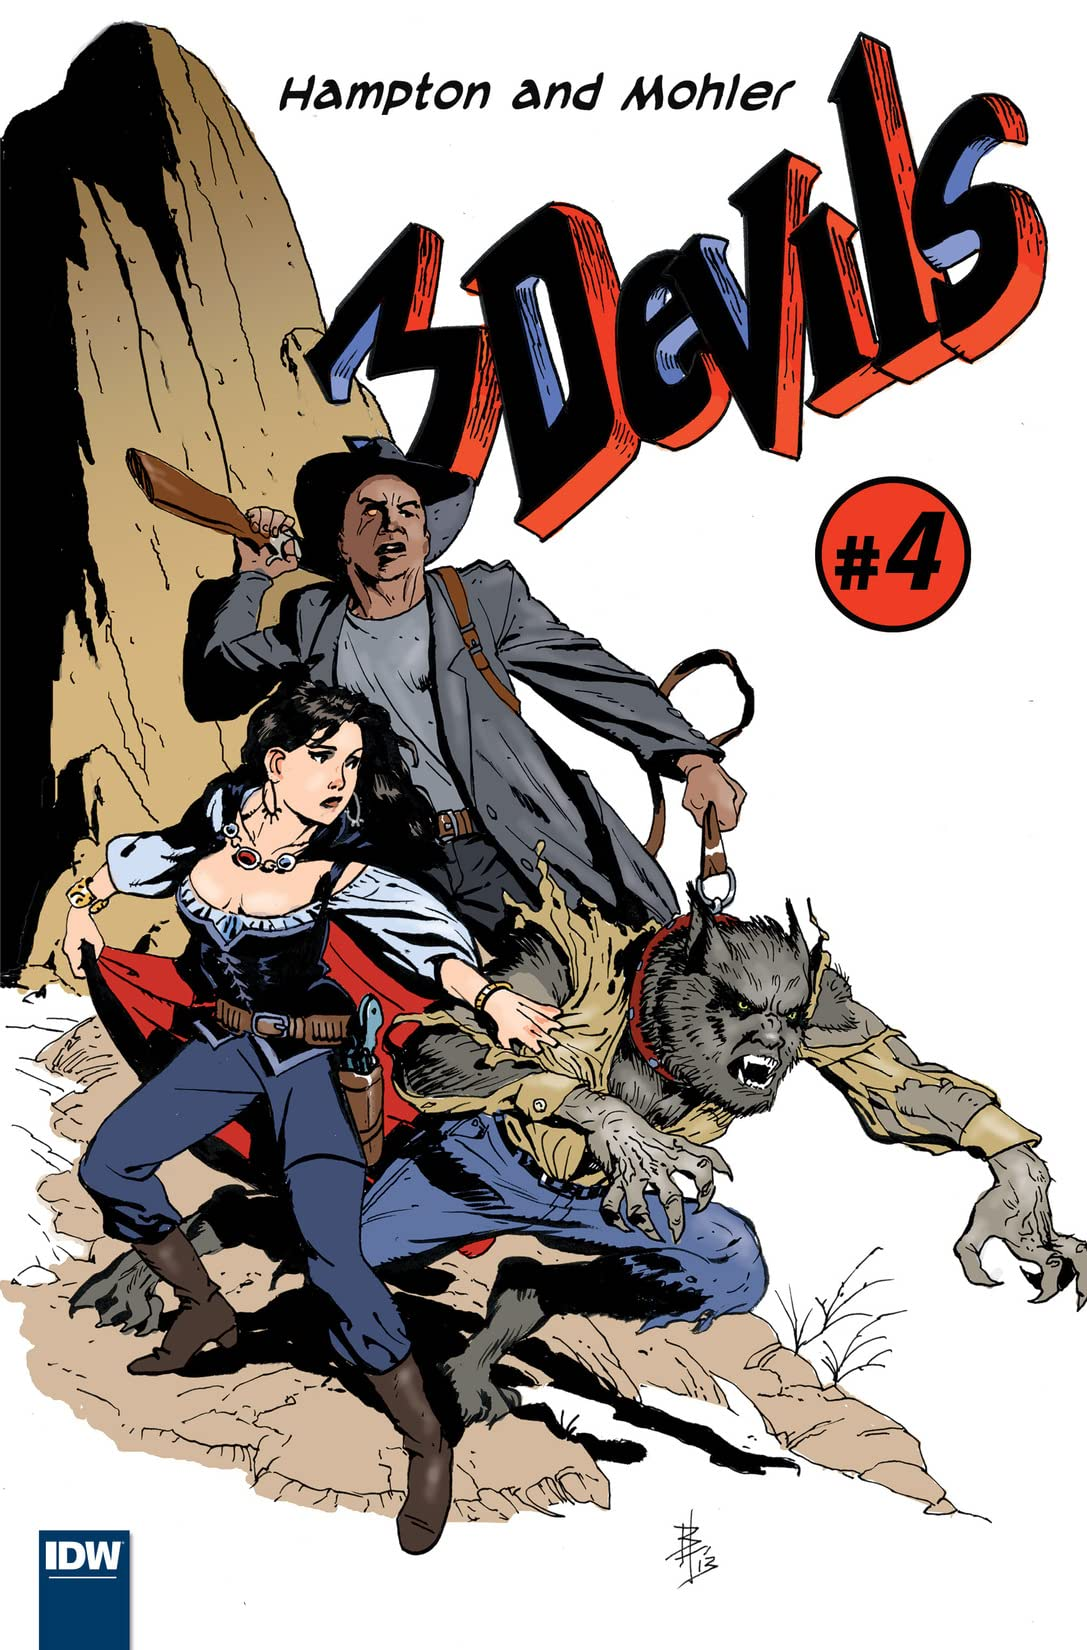 3 Devils #4 (of 4)